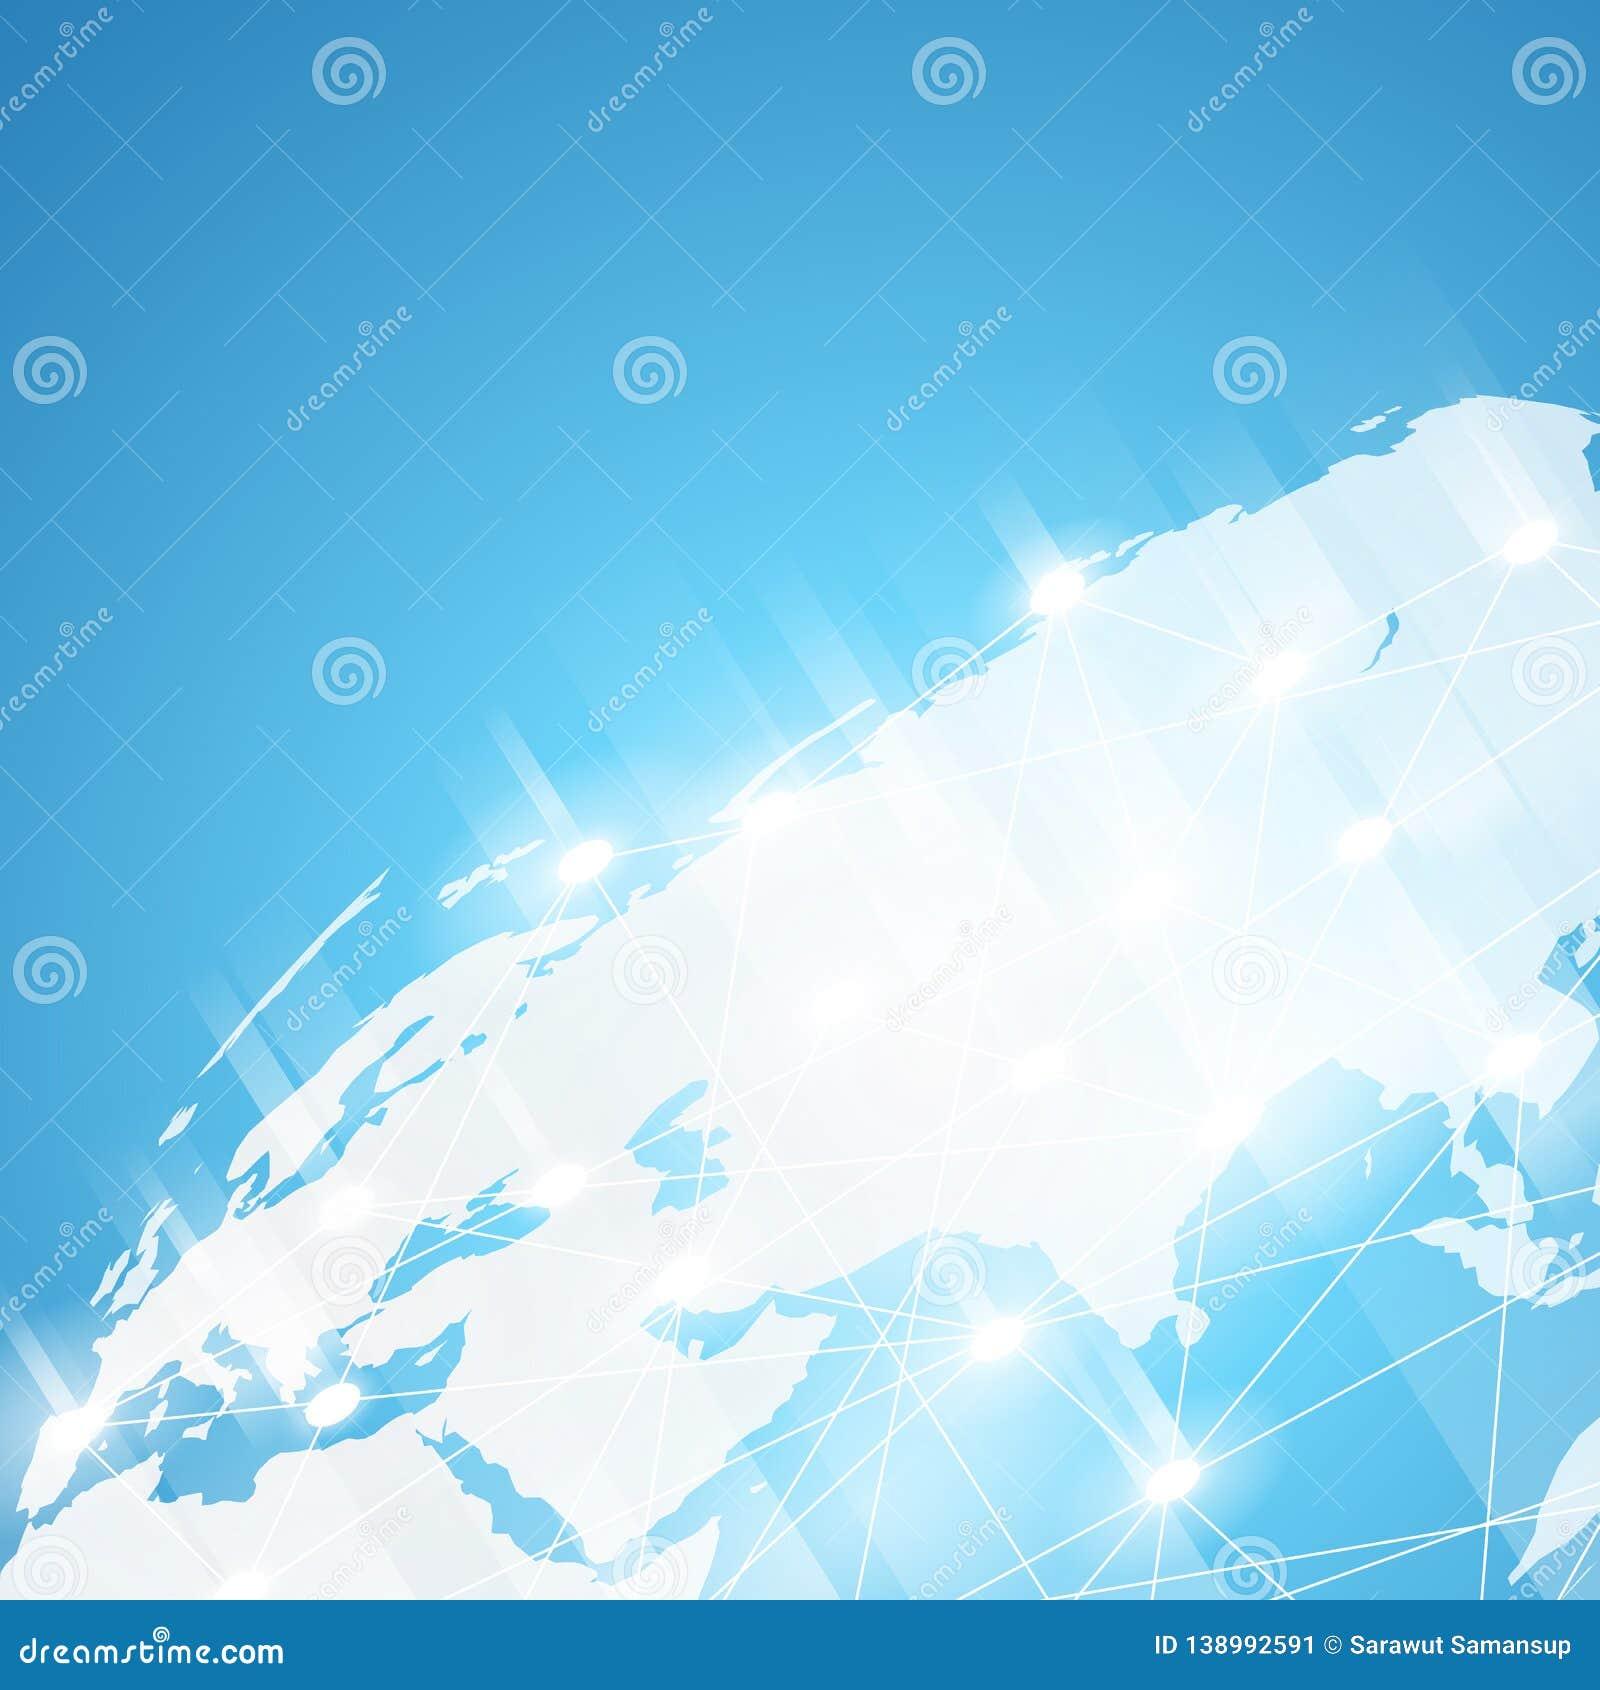 World technology background,worldwide network vector